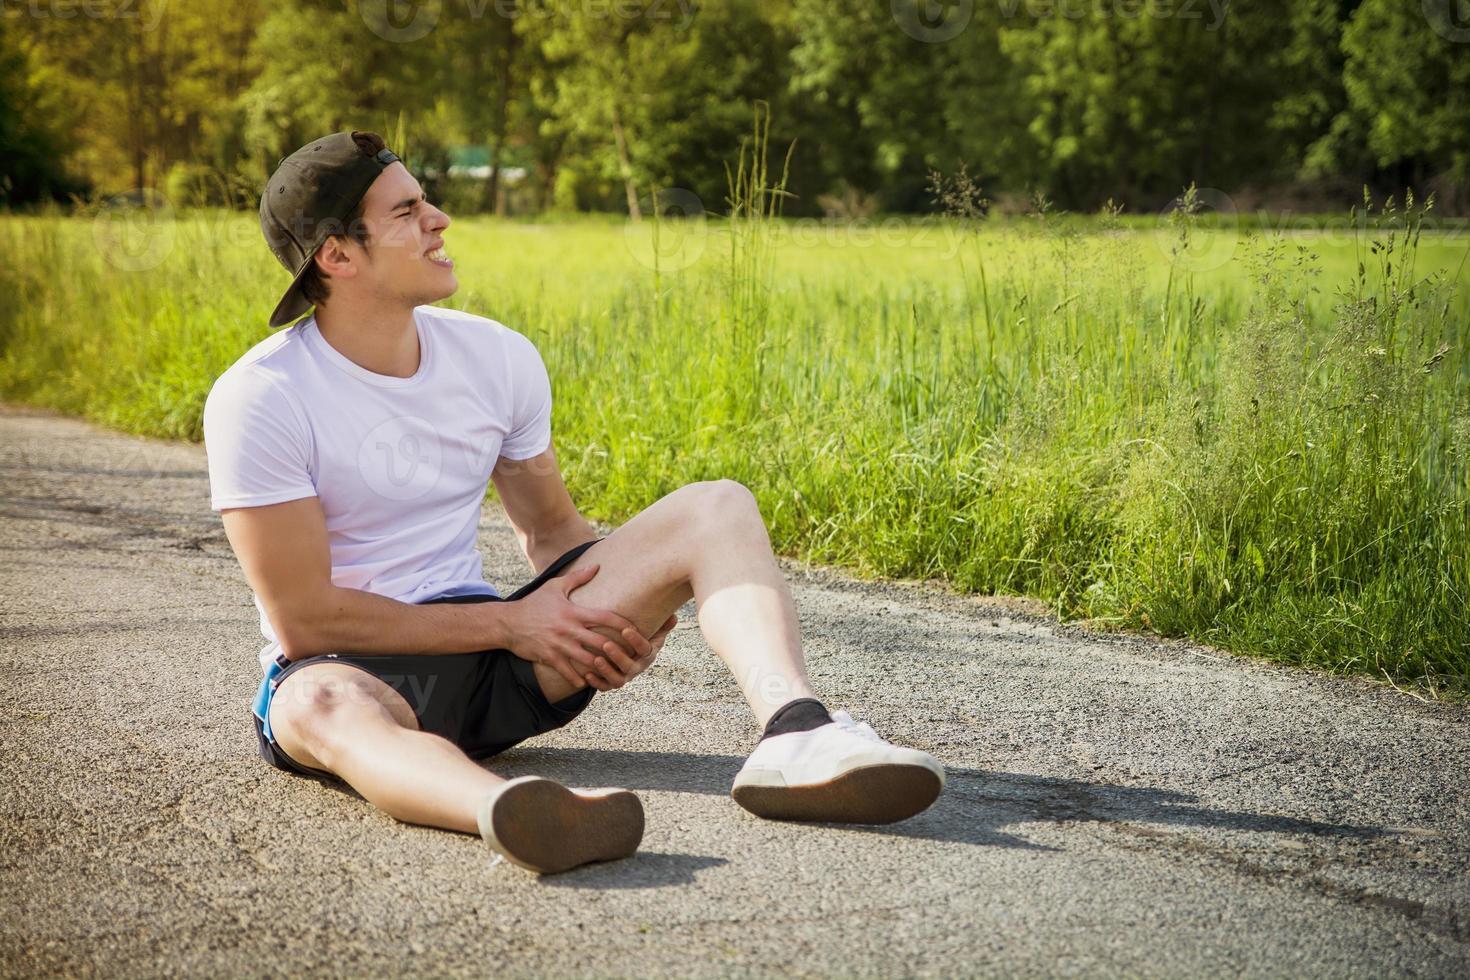 jovem bonito ferido enquanto correndo e correndo na estrada foto